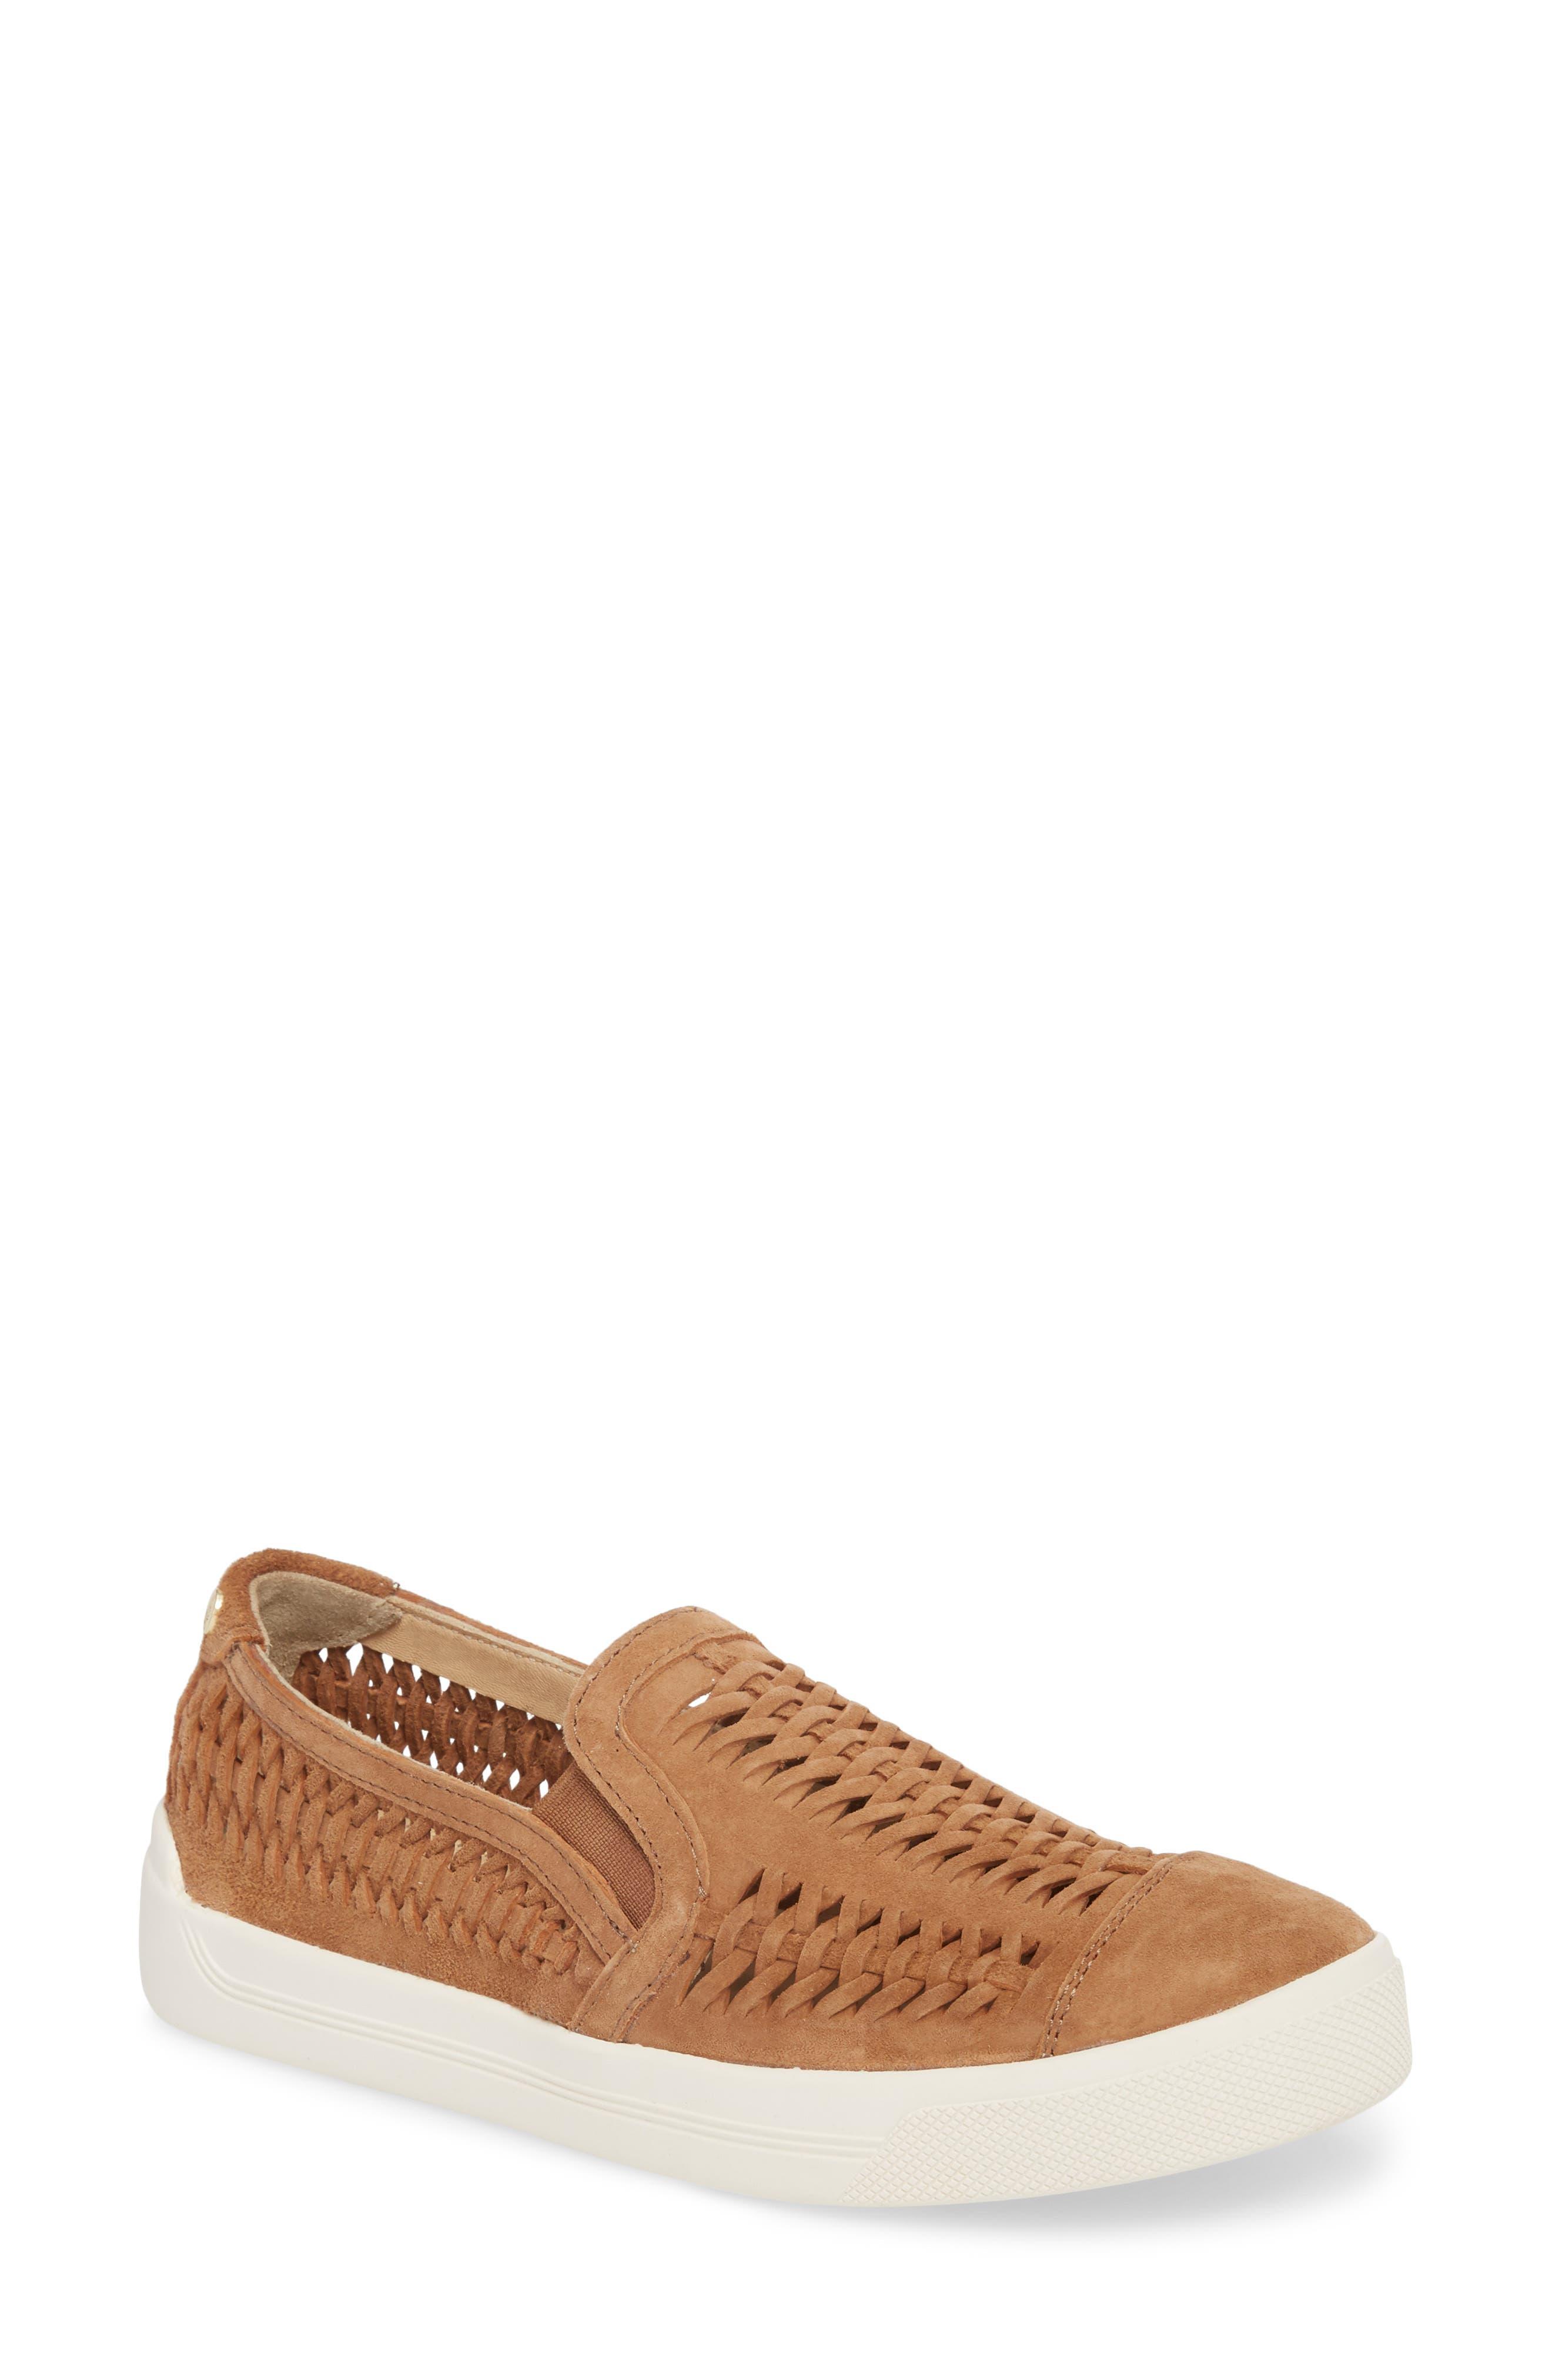 Gabbie Slip-On Sneaker,                             Main thumbnail 1, color,                             Tan Suede